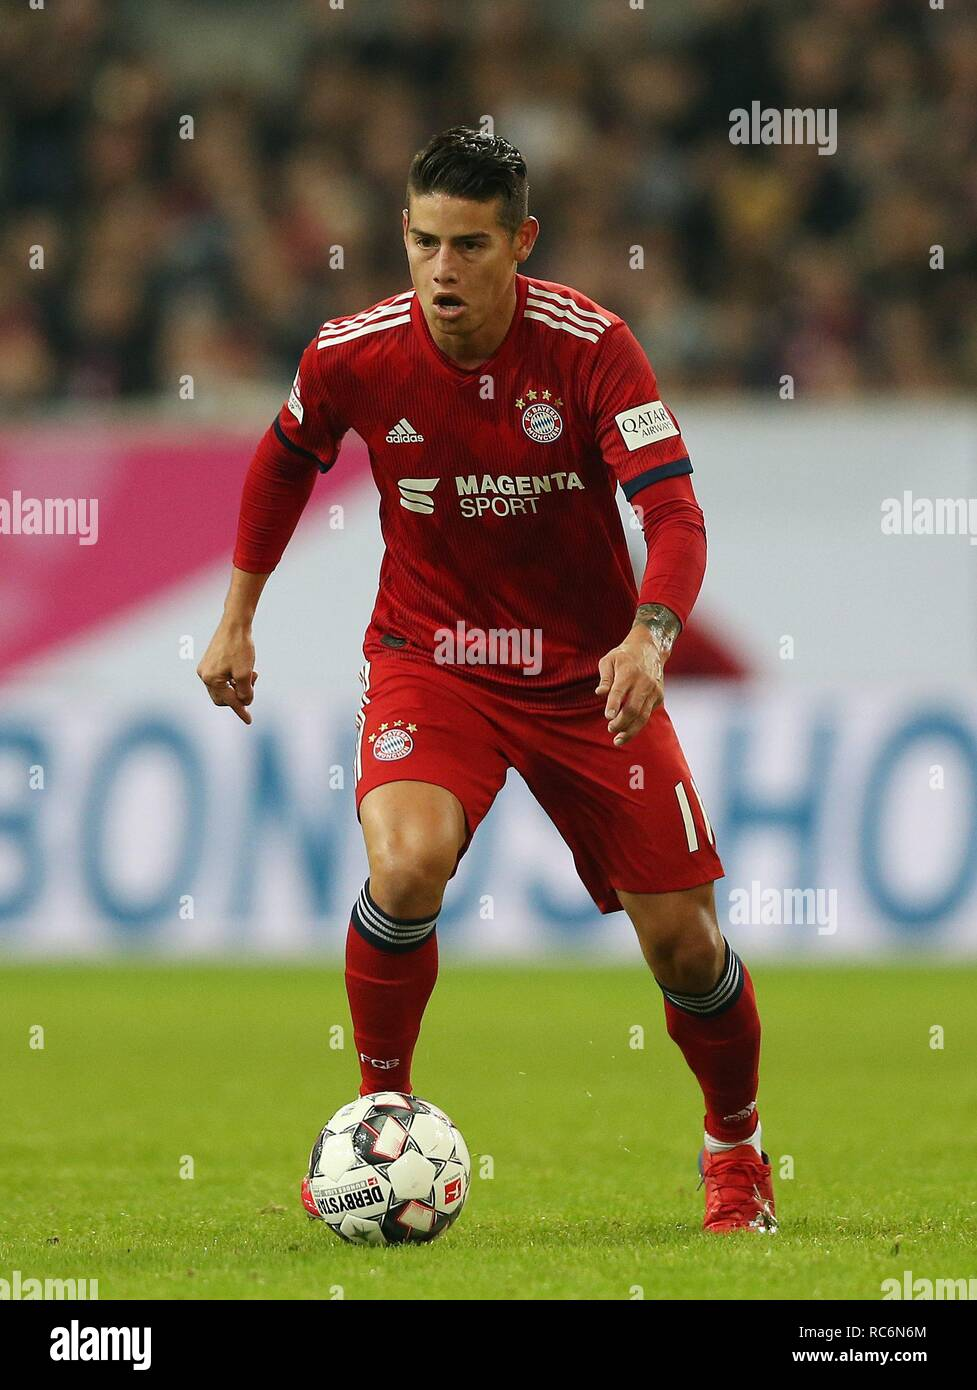 firo: 13.01.2019, football, 1.Bundesliga, season 2018/2019, Telekom-Cup 2019, FC Bayern Munich, JAMES Rodriguez, single action   usage worldwide - Stock Image